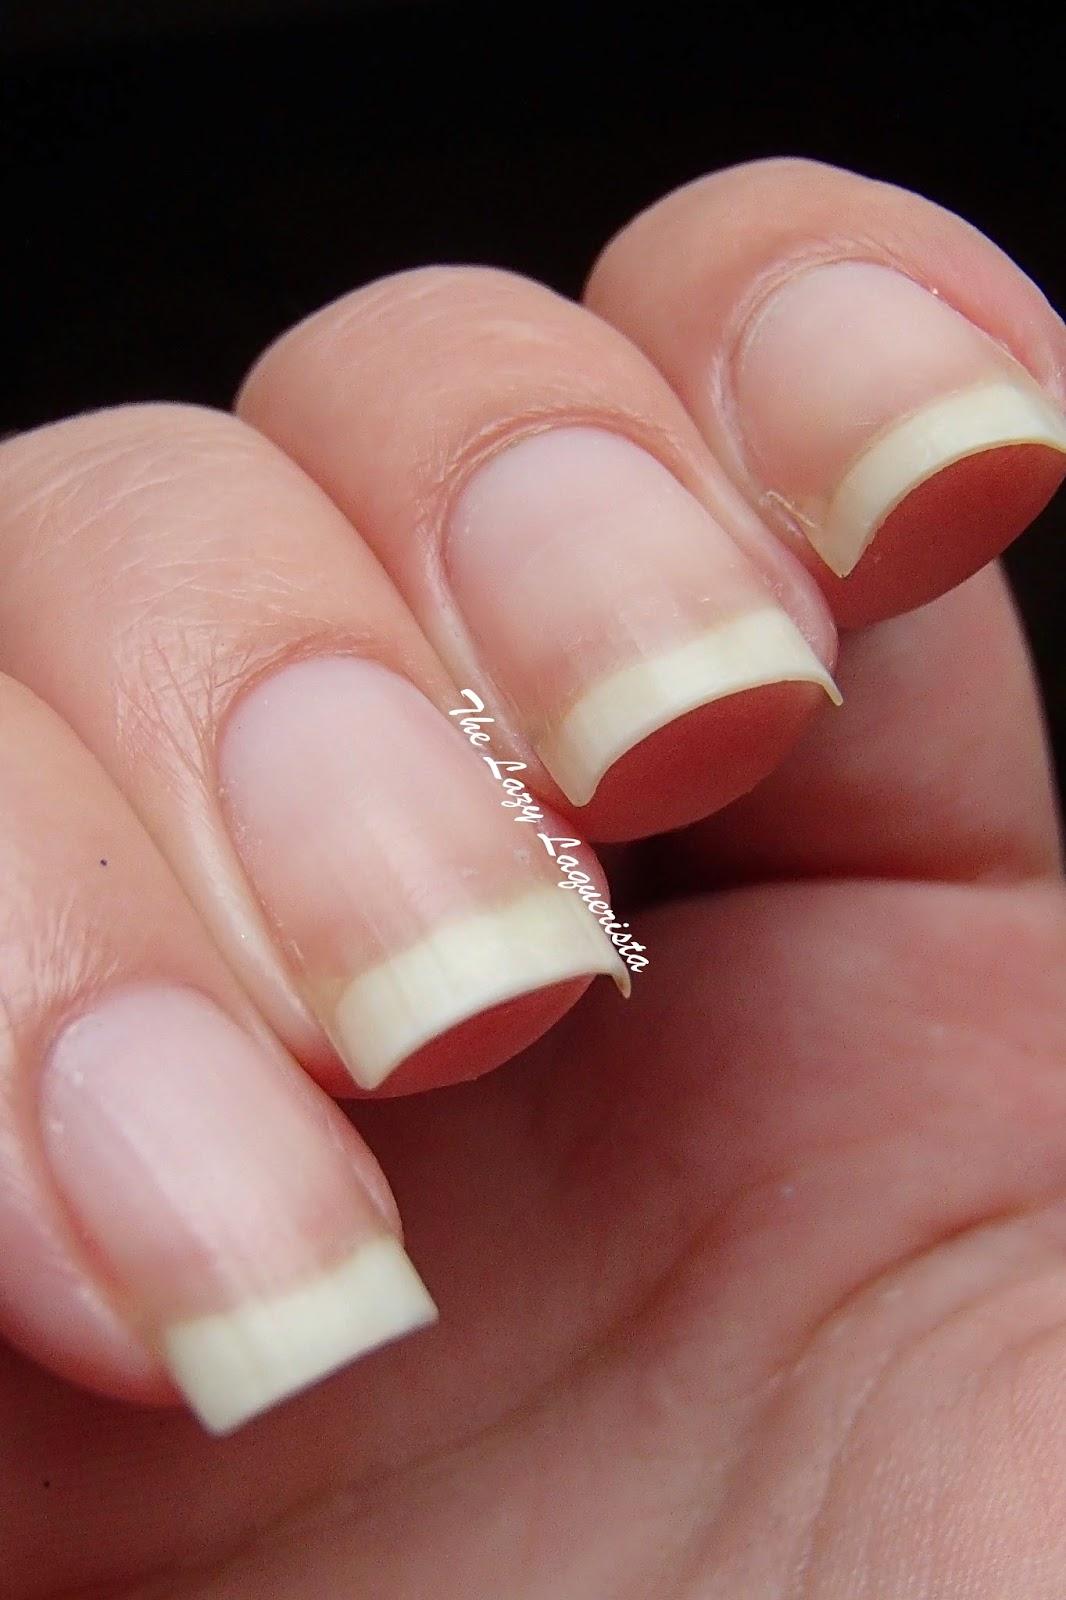 Manicure Manifesto: Broadway Nails imPress Press-On Manicure Review